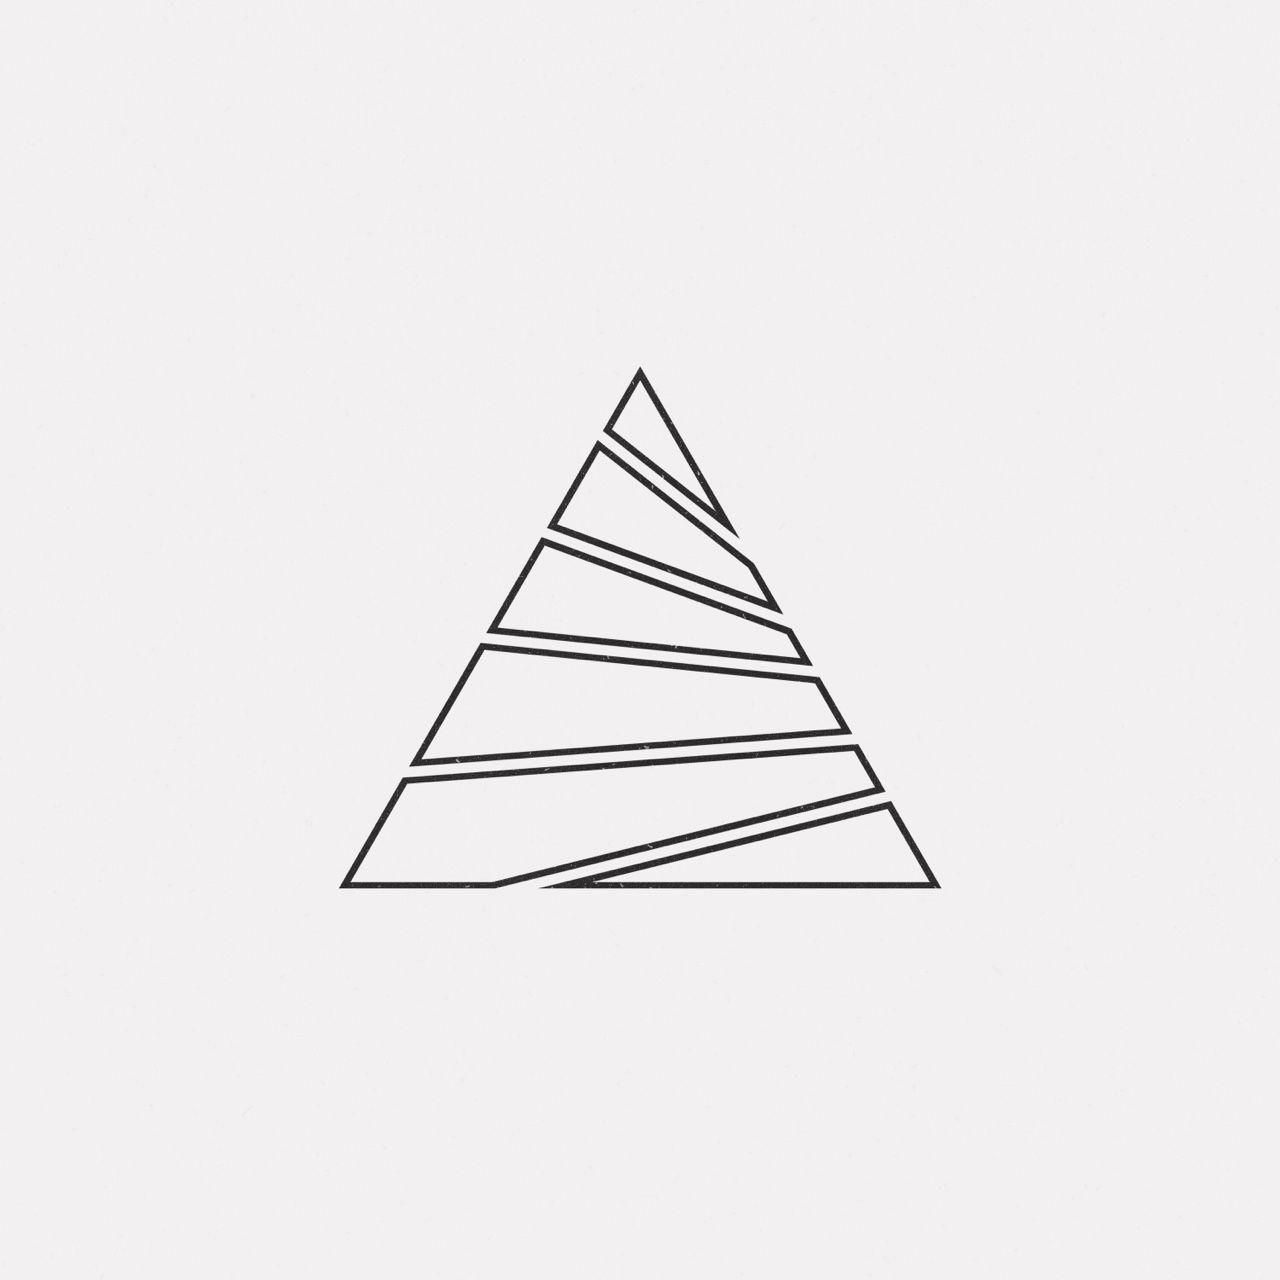 #MA17-877 A new geometric design every day